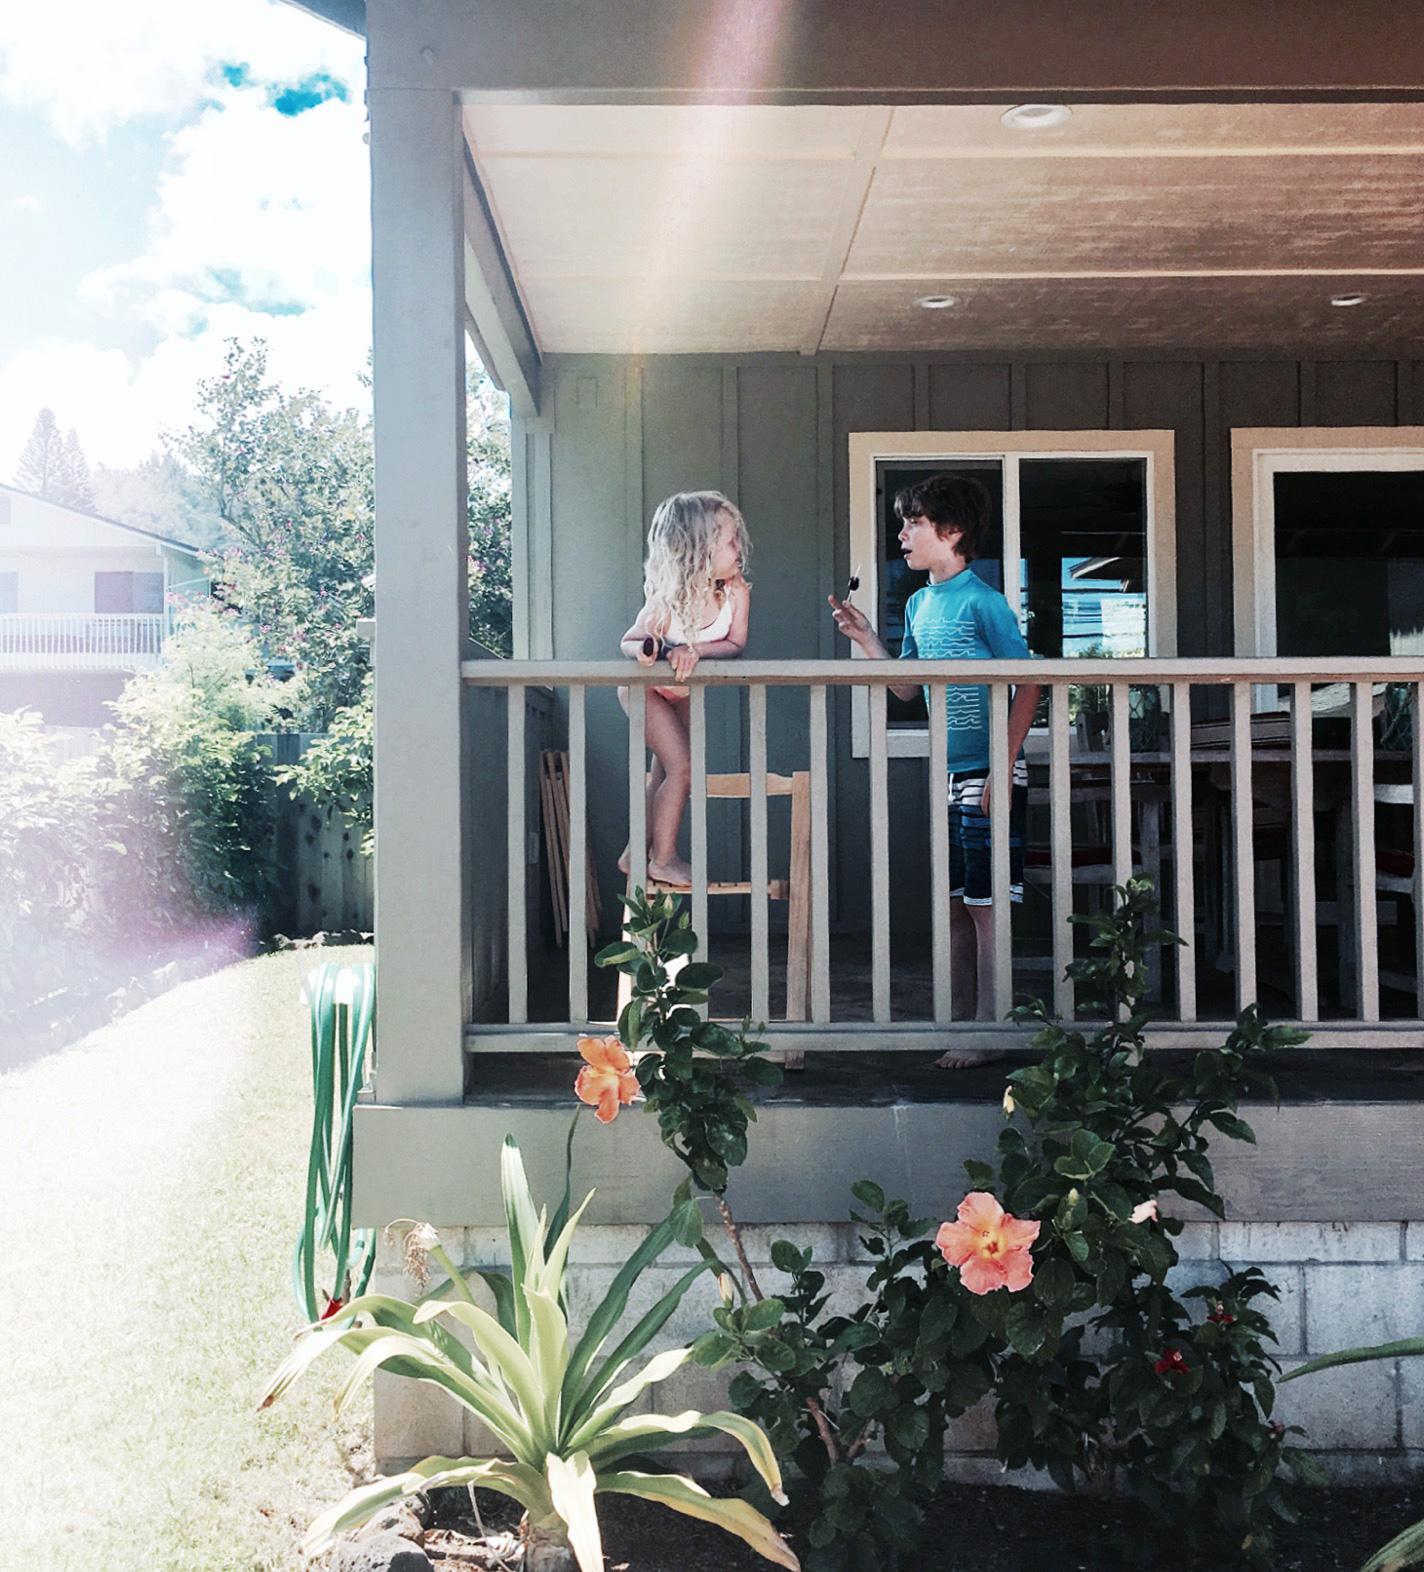 Beach House In Oahu: Visiting Oahu With Kids